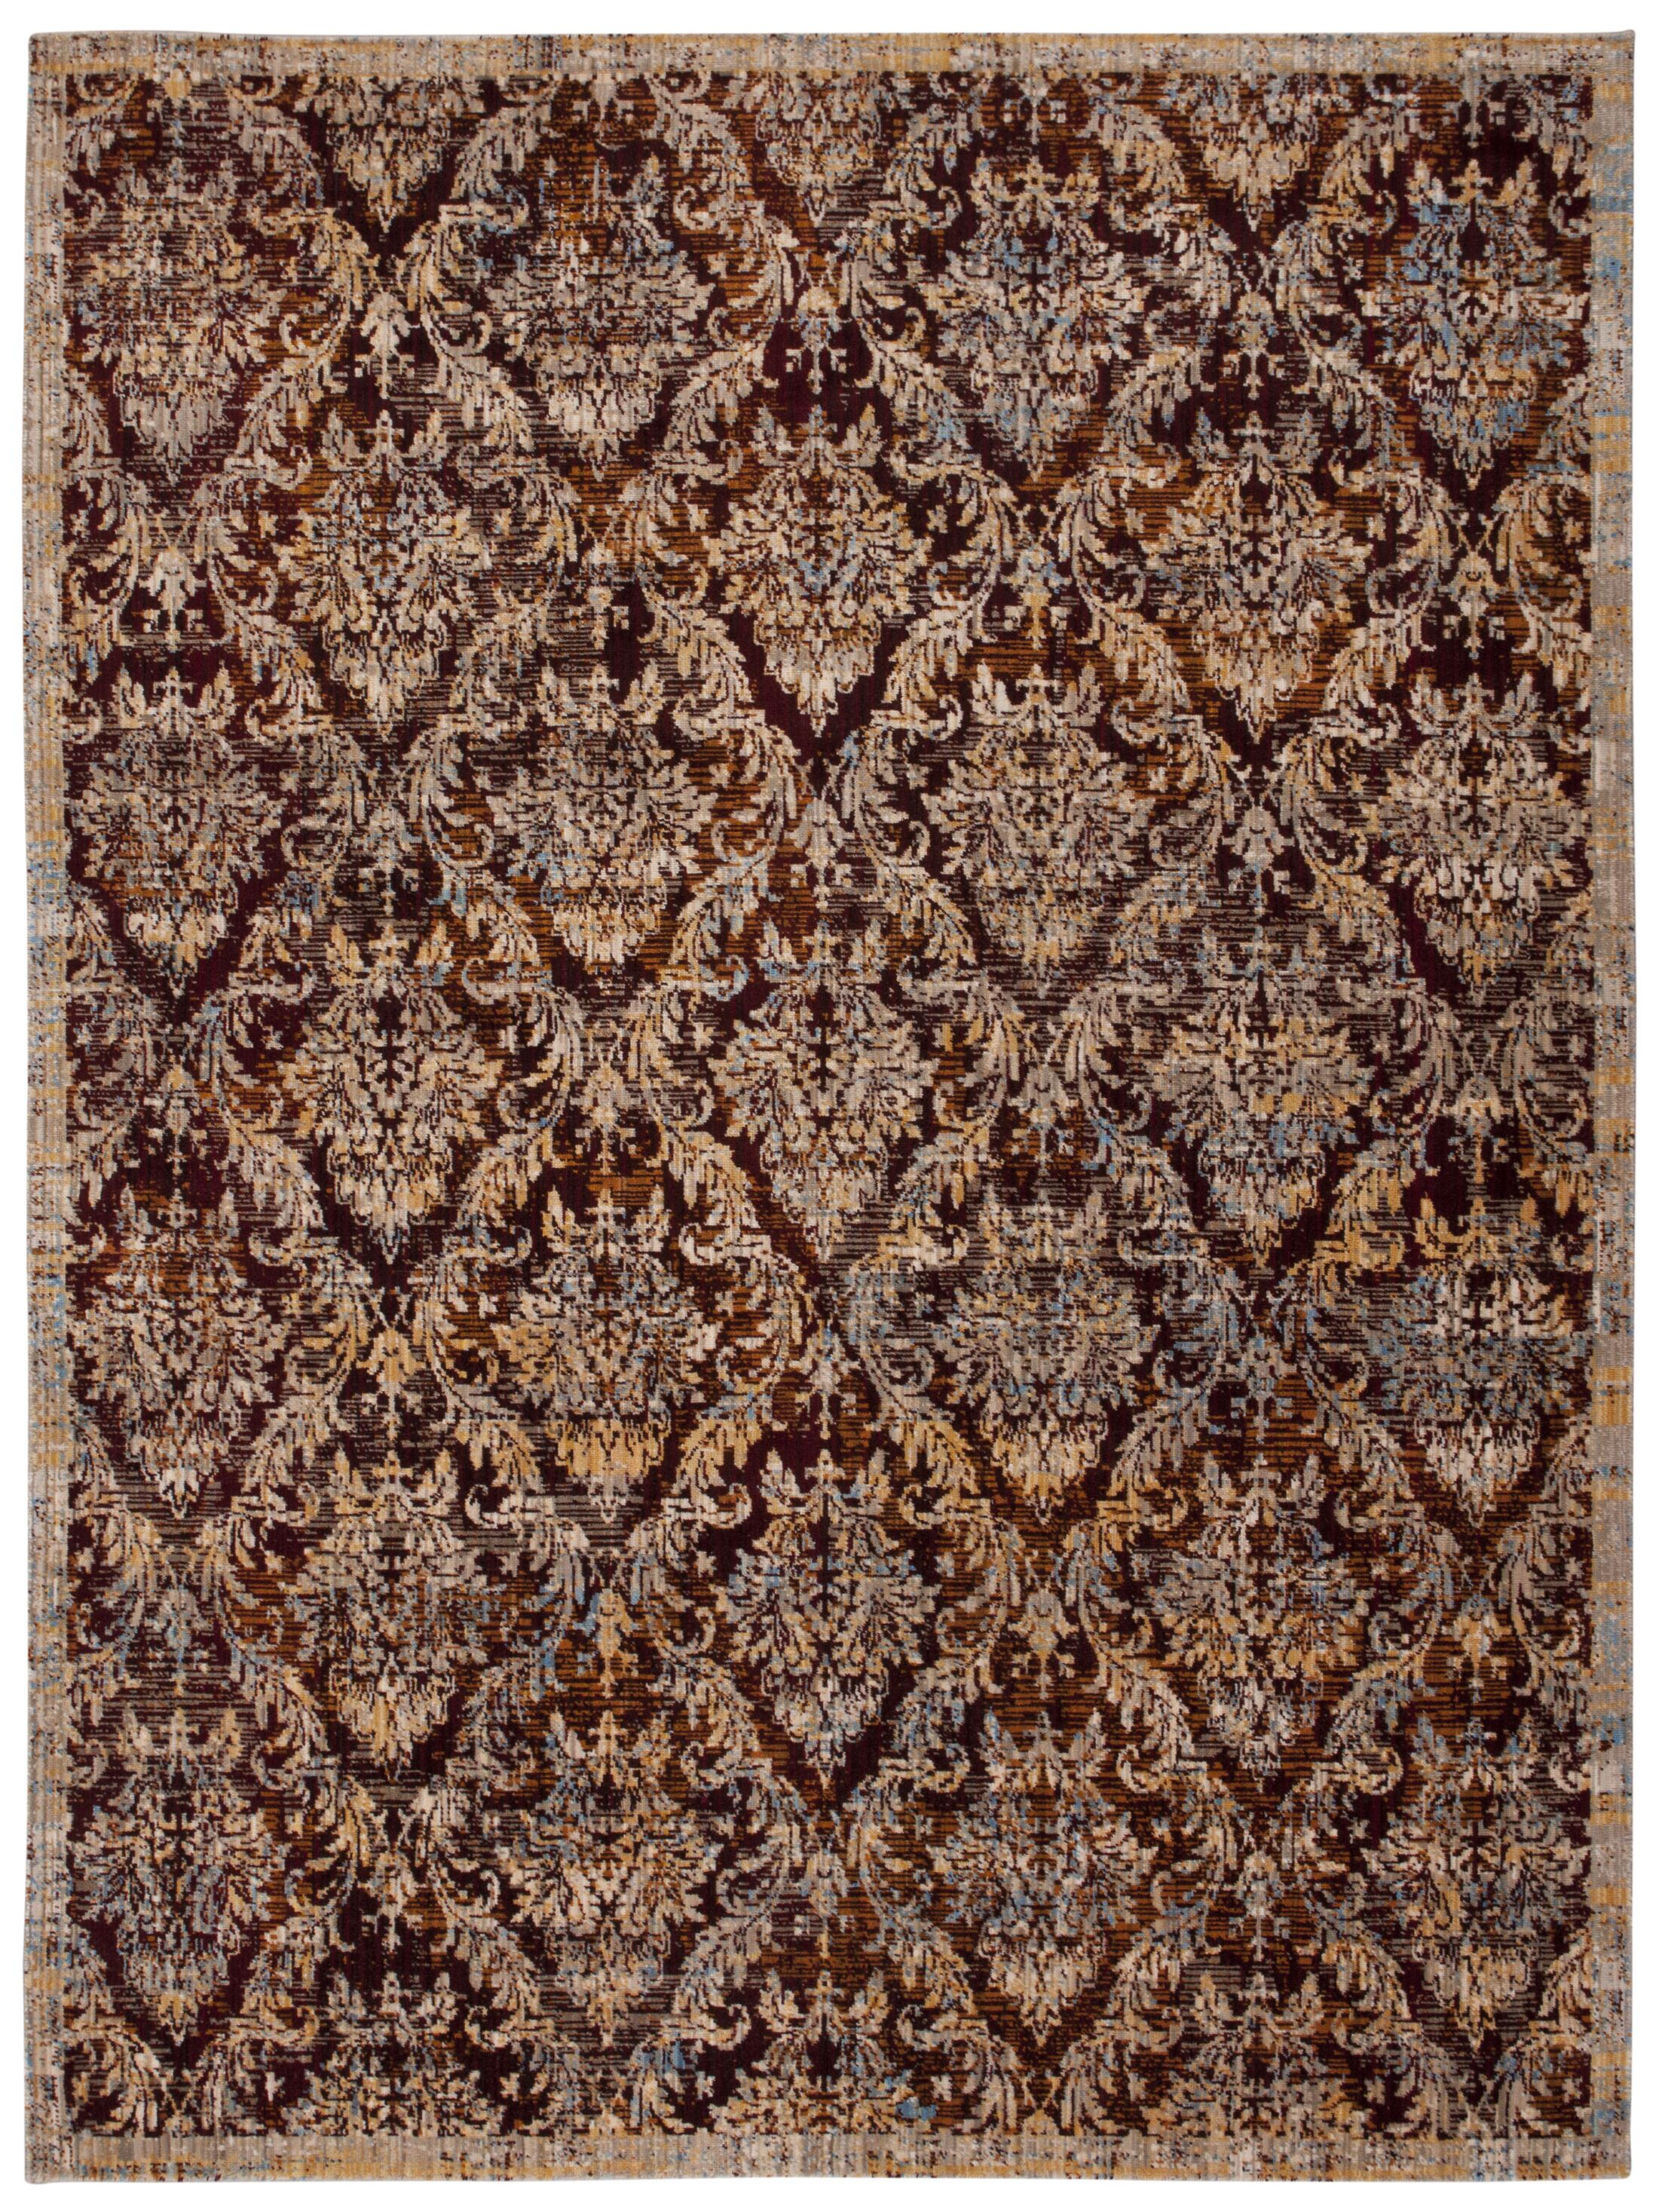 Moroccan Garnet Rug Rug Size: Rectangle 5'3